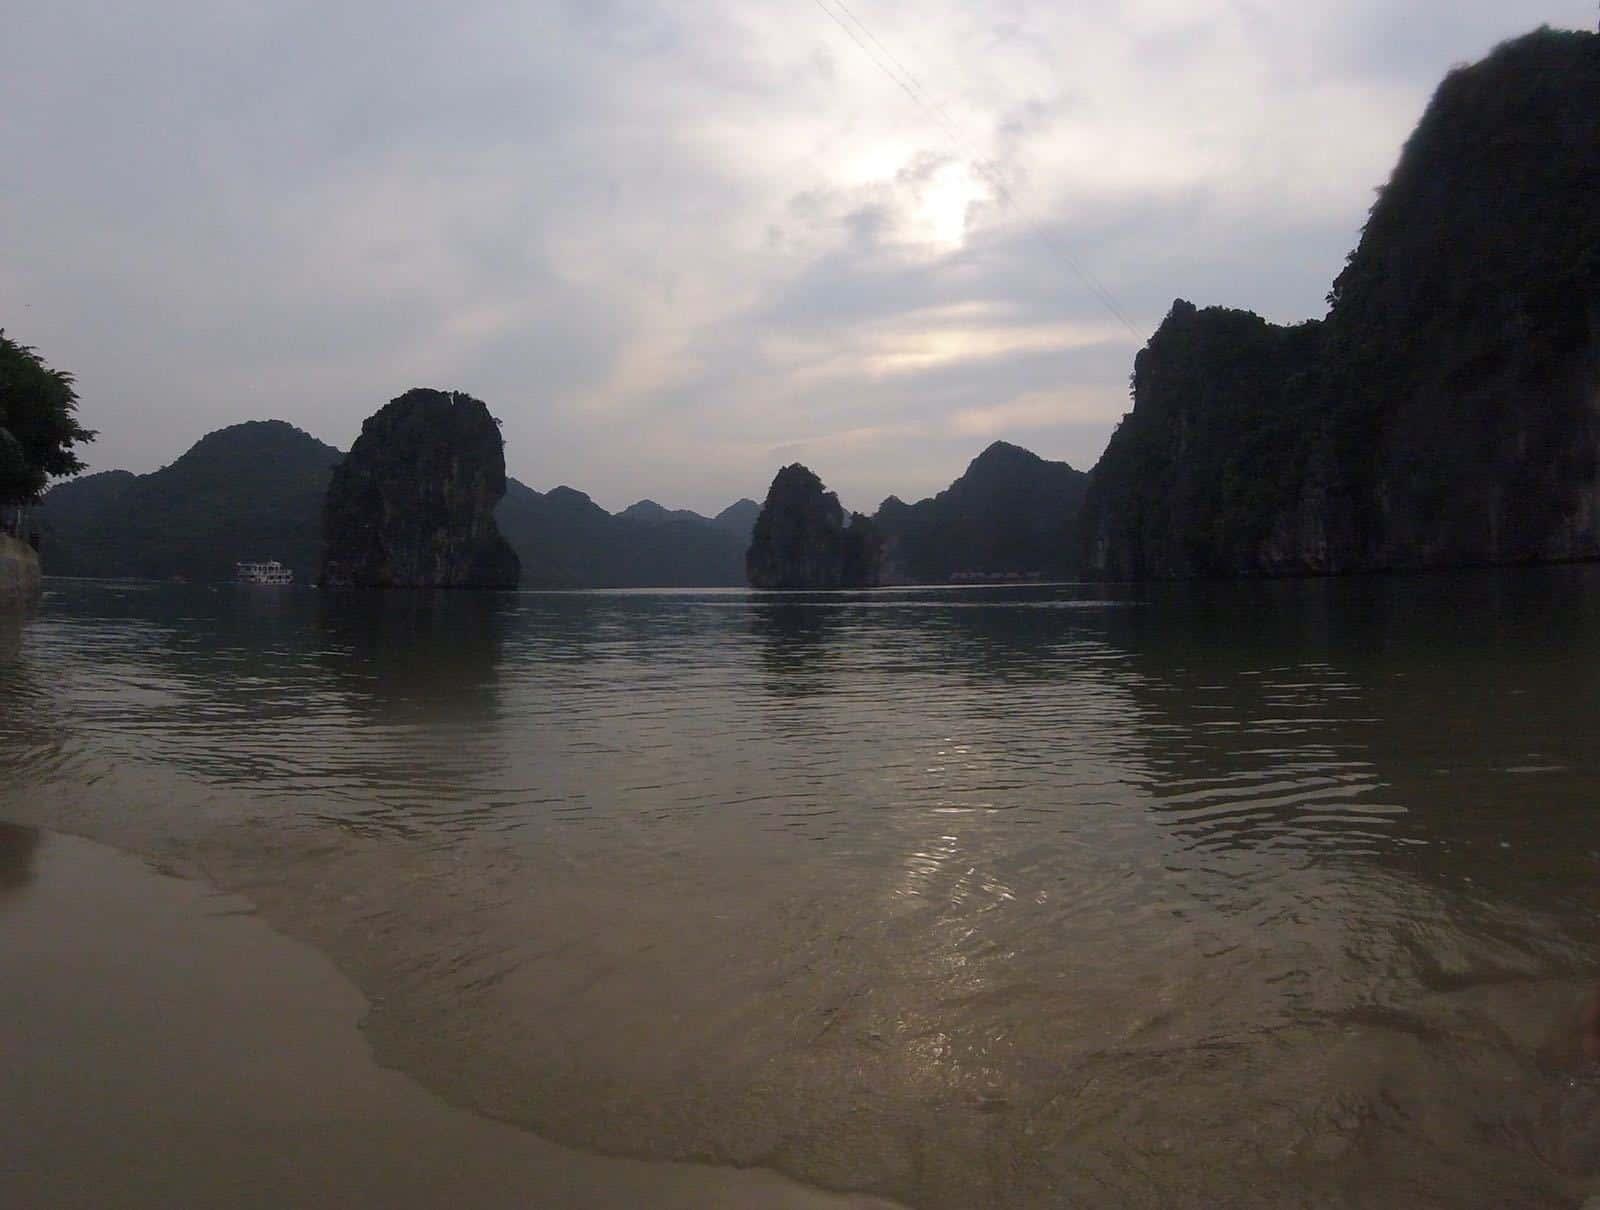 A beach in Halong Bay, Vietnam.